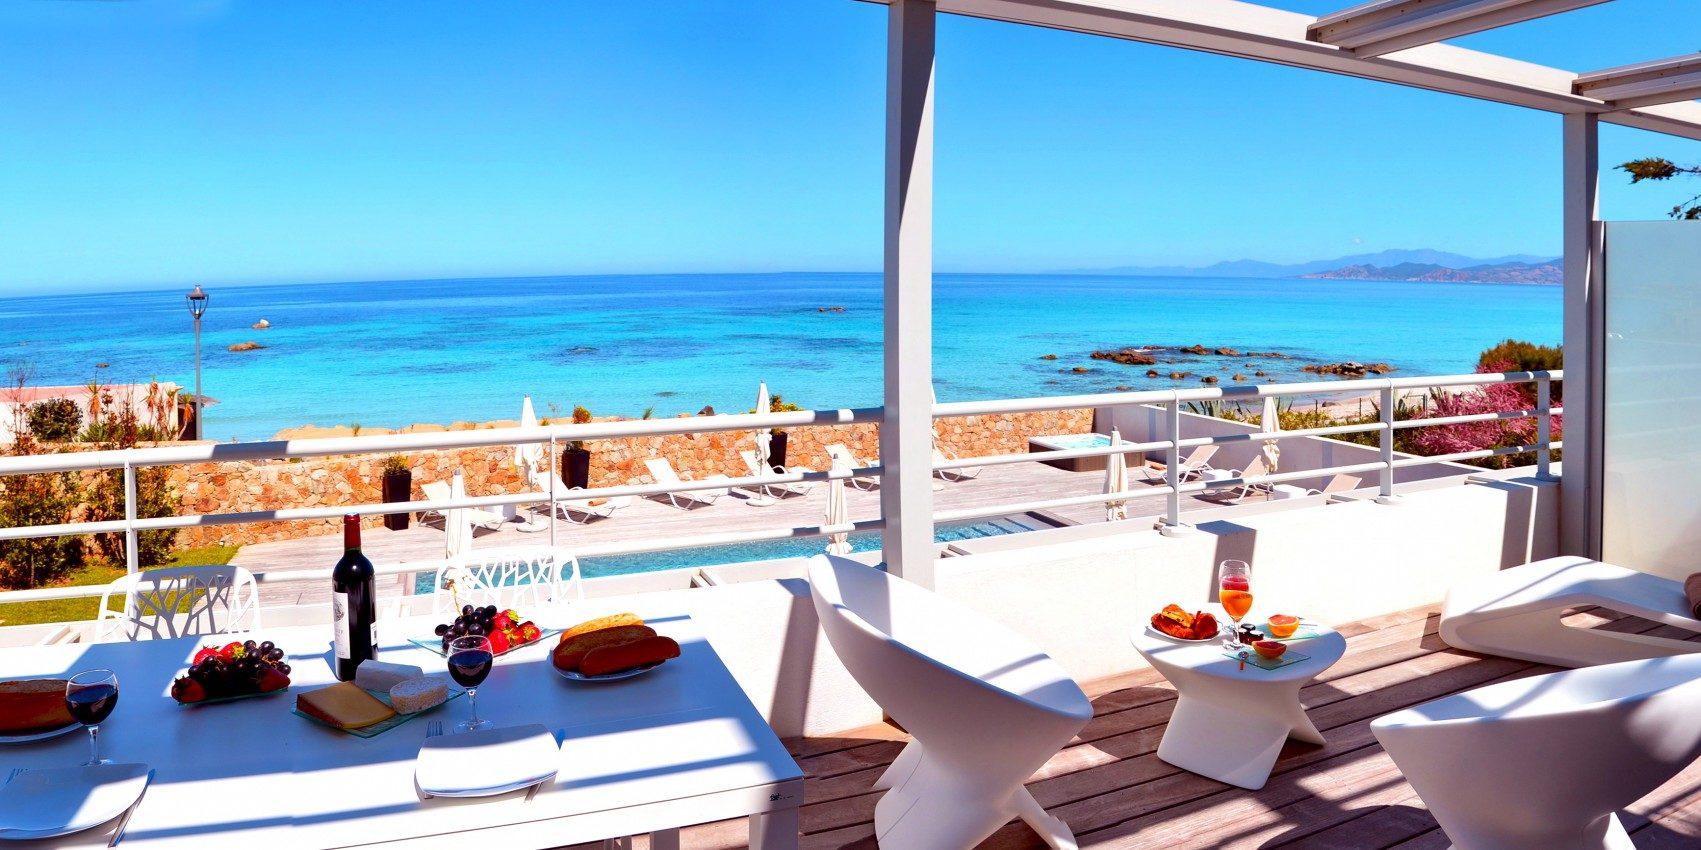 Residence Dary Ile Rousse Balagne Corsica Frankrijk terras zeezicht